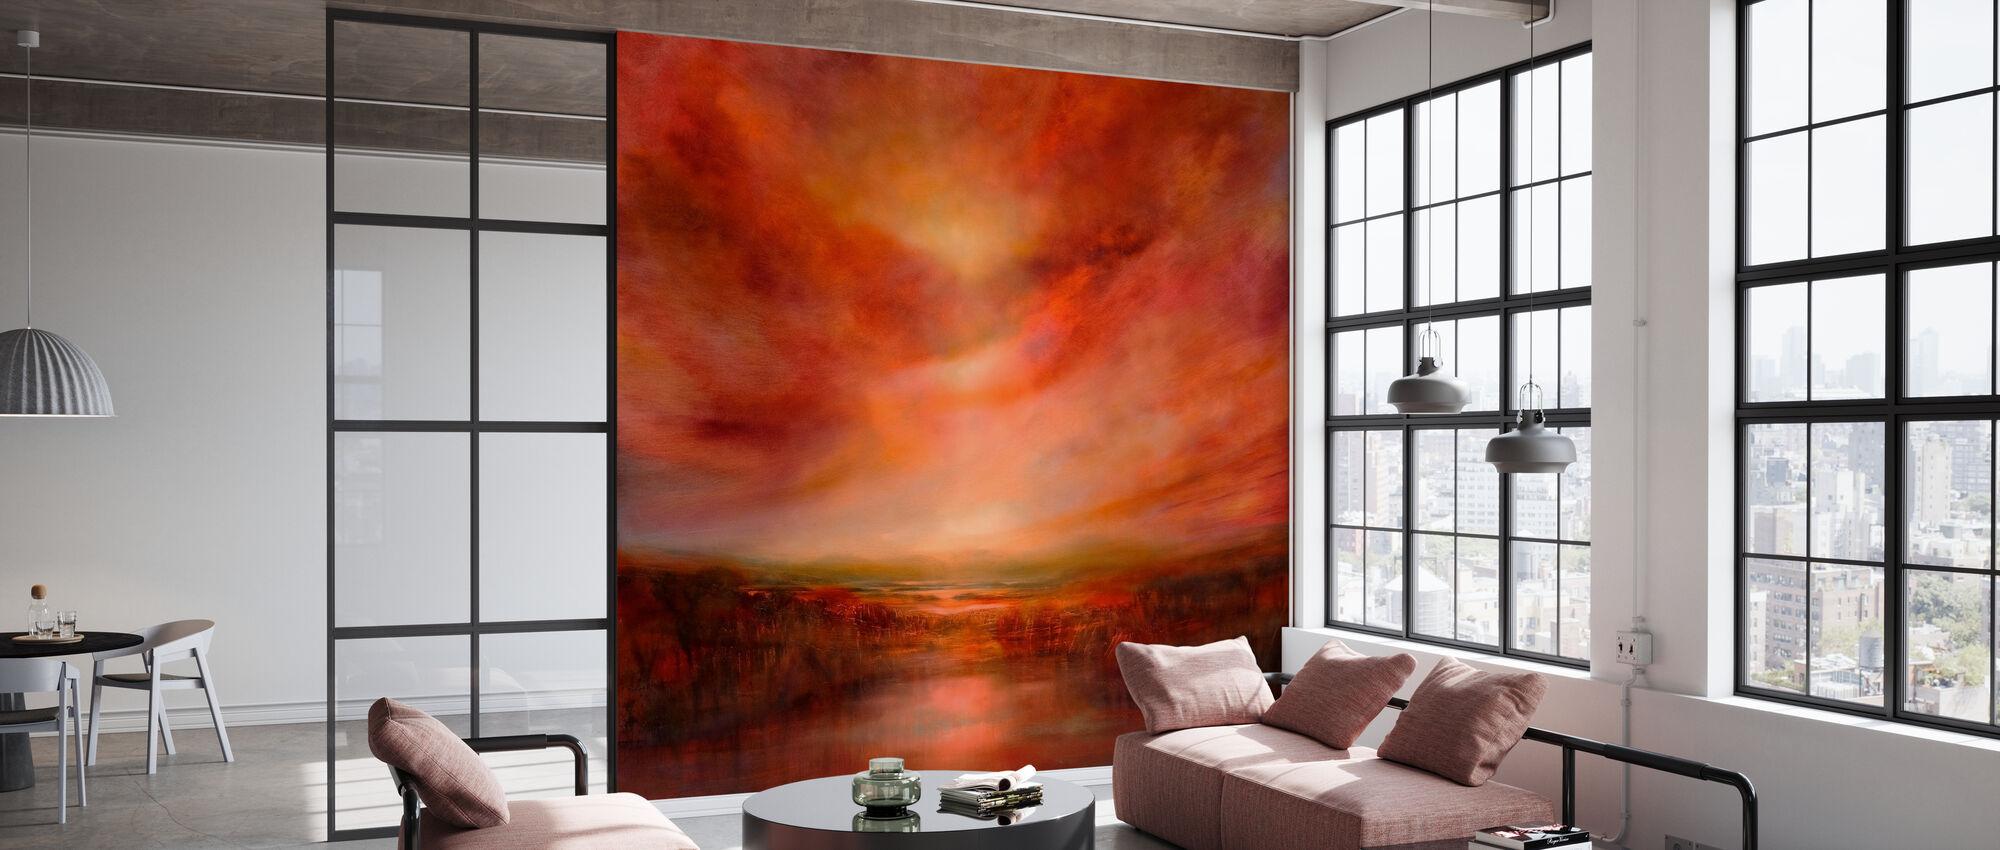 Evening Glow II - Wallpaper - Office